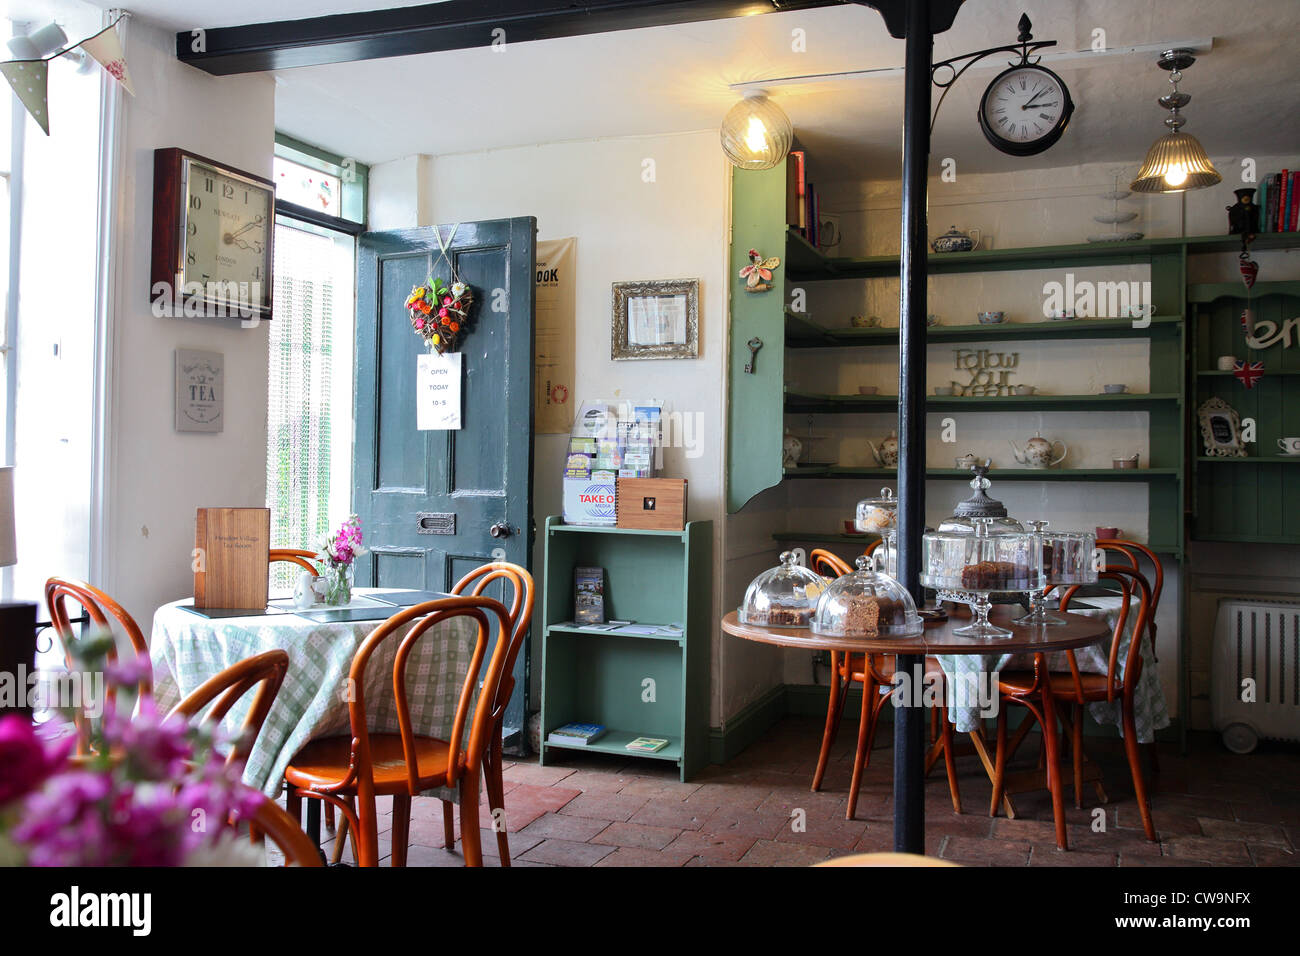 Tea shop in Heydon, Norfolk, UK - Stock Image